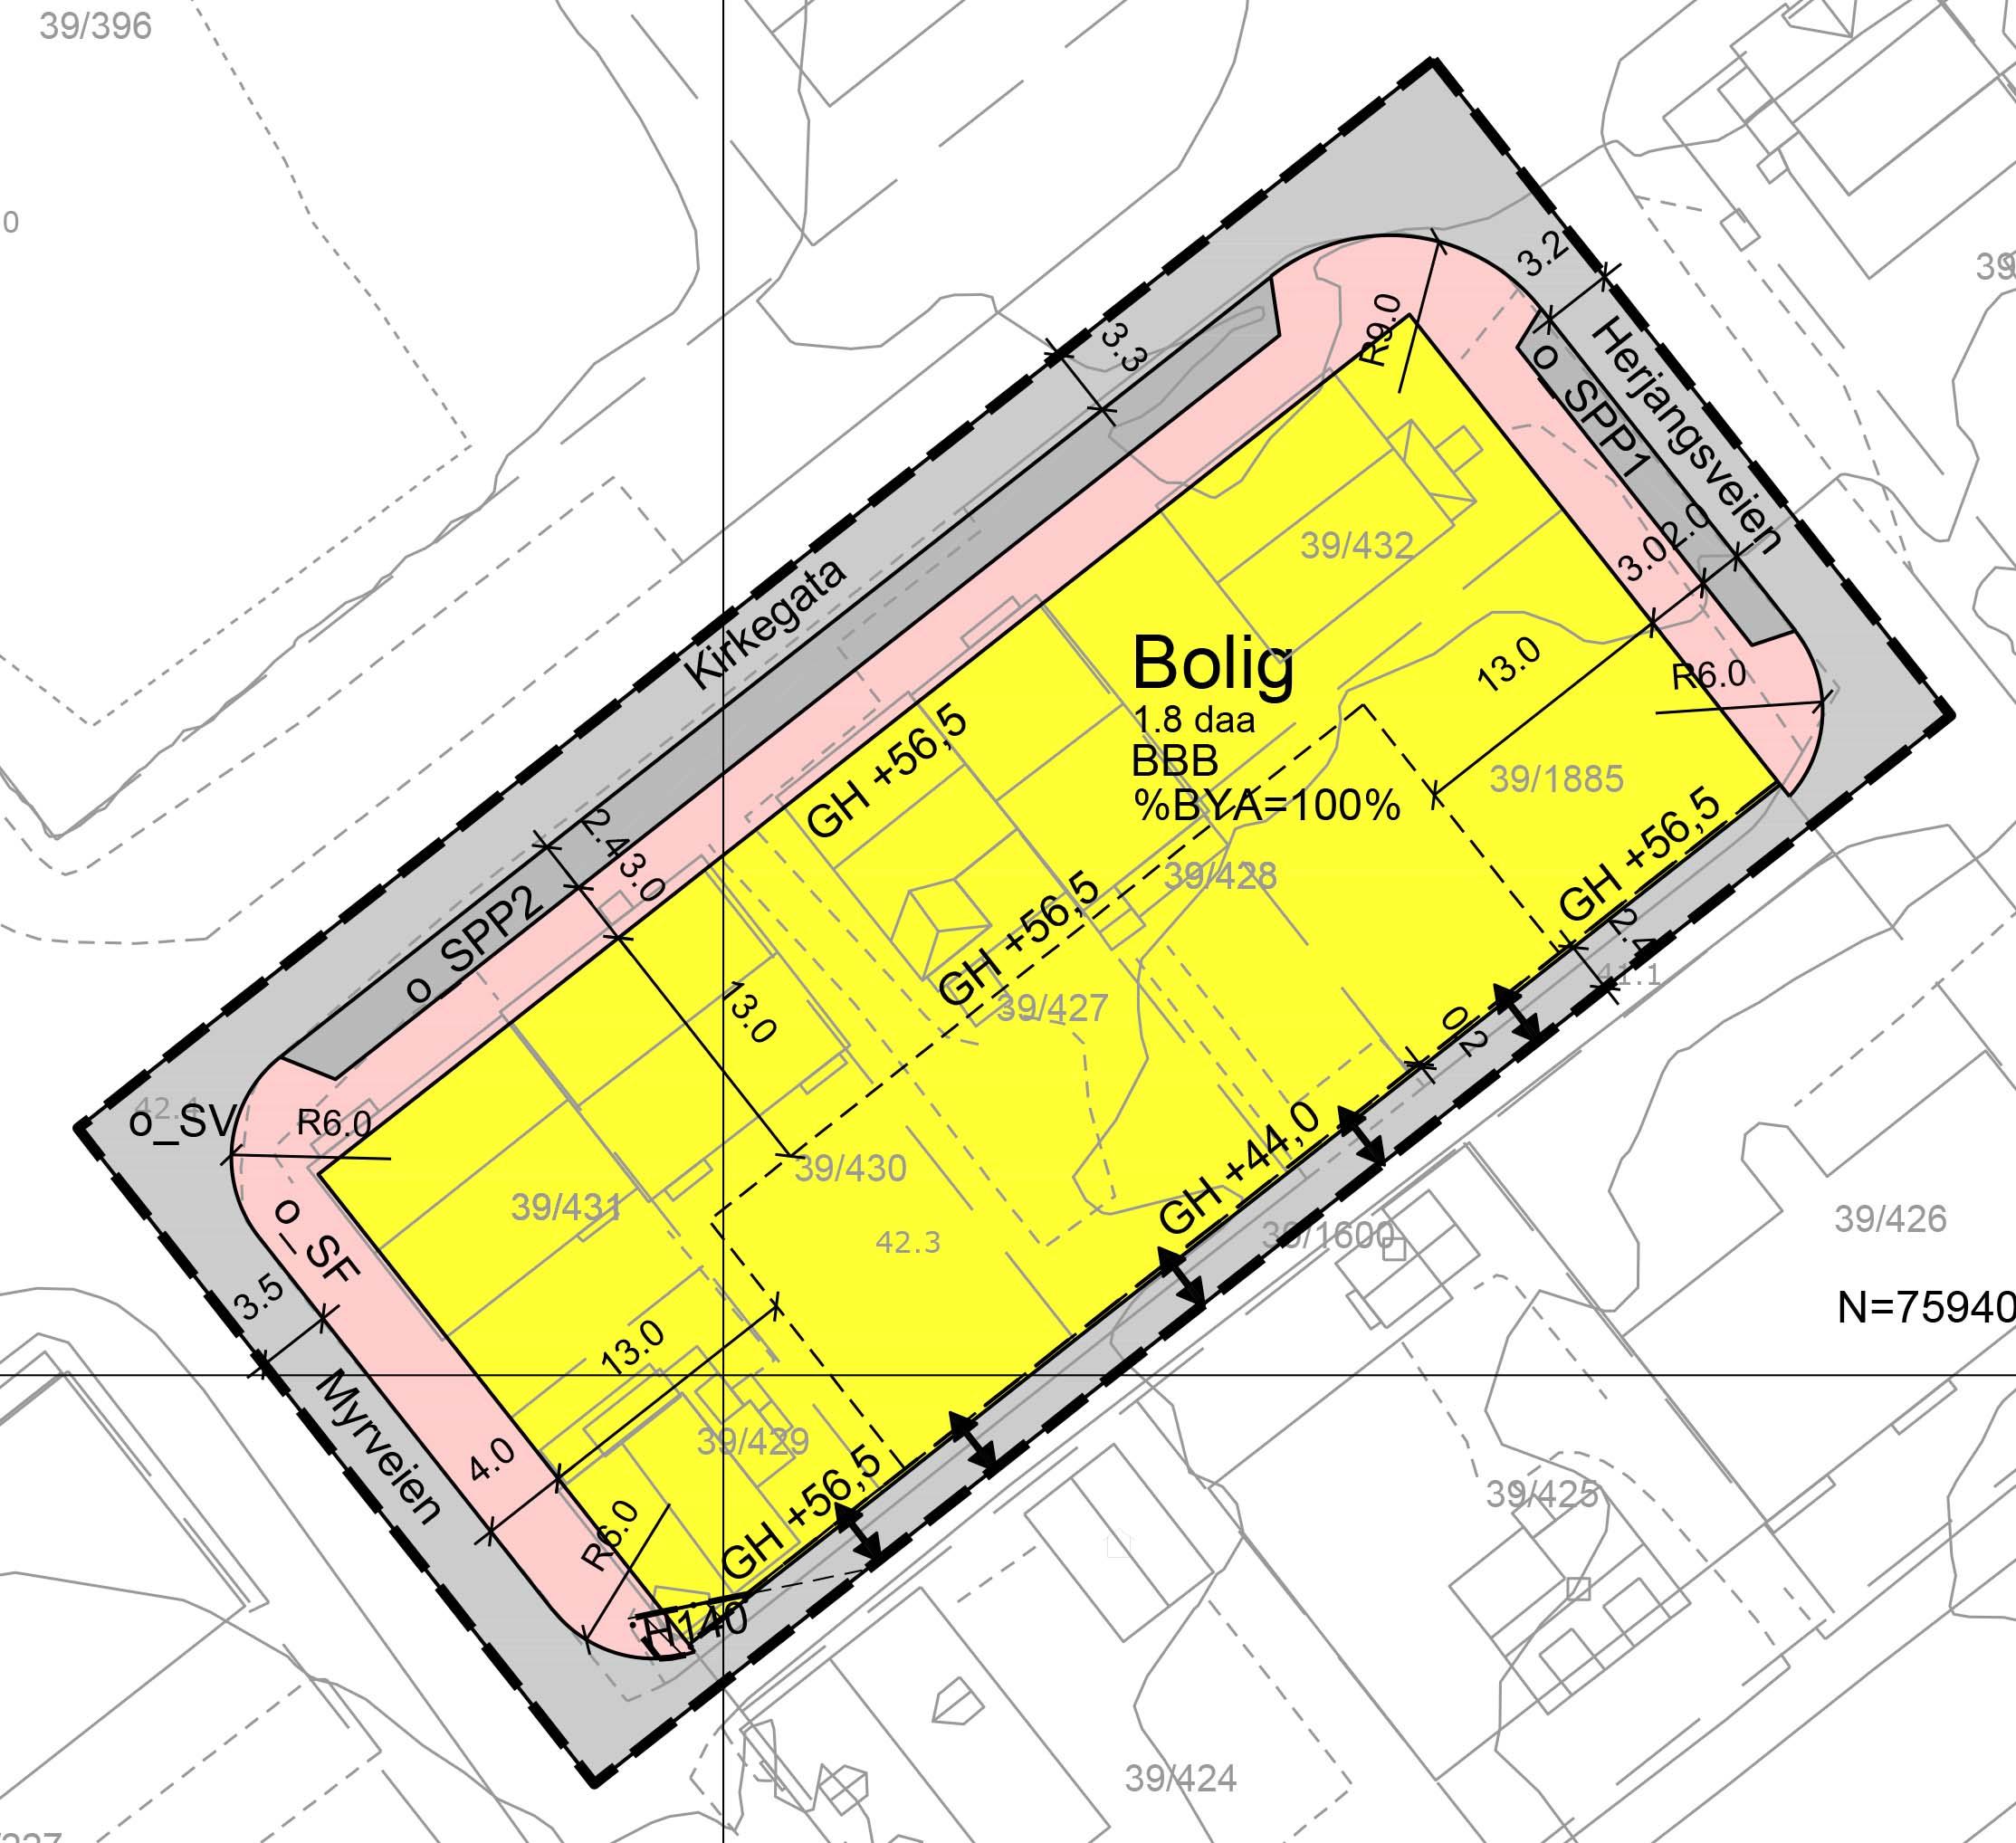 Kirkegata 48-52-Reguleringsplan_2018-04-30.jpg